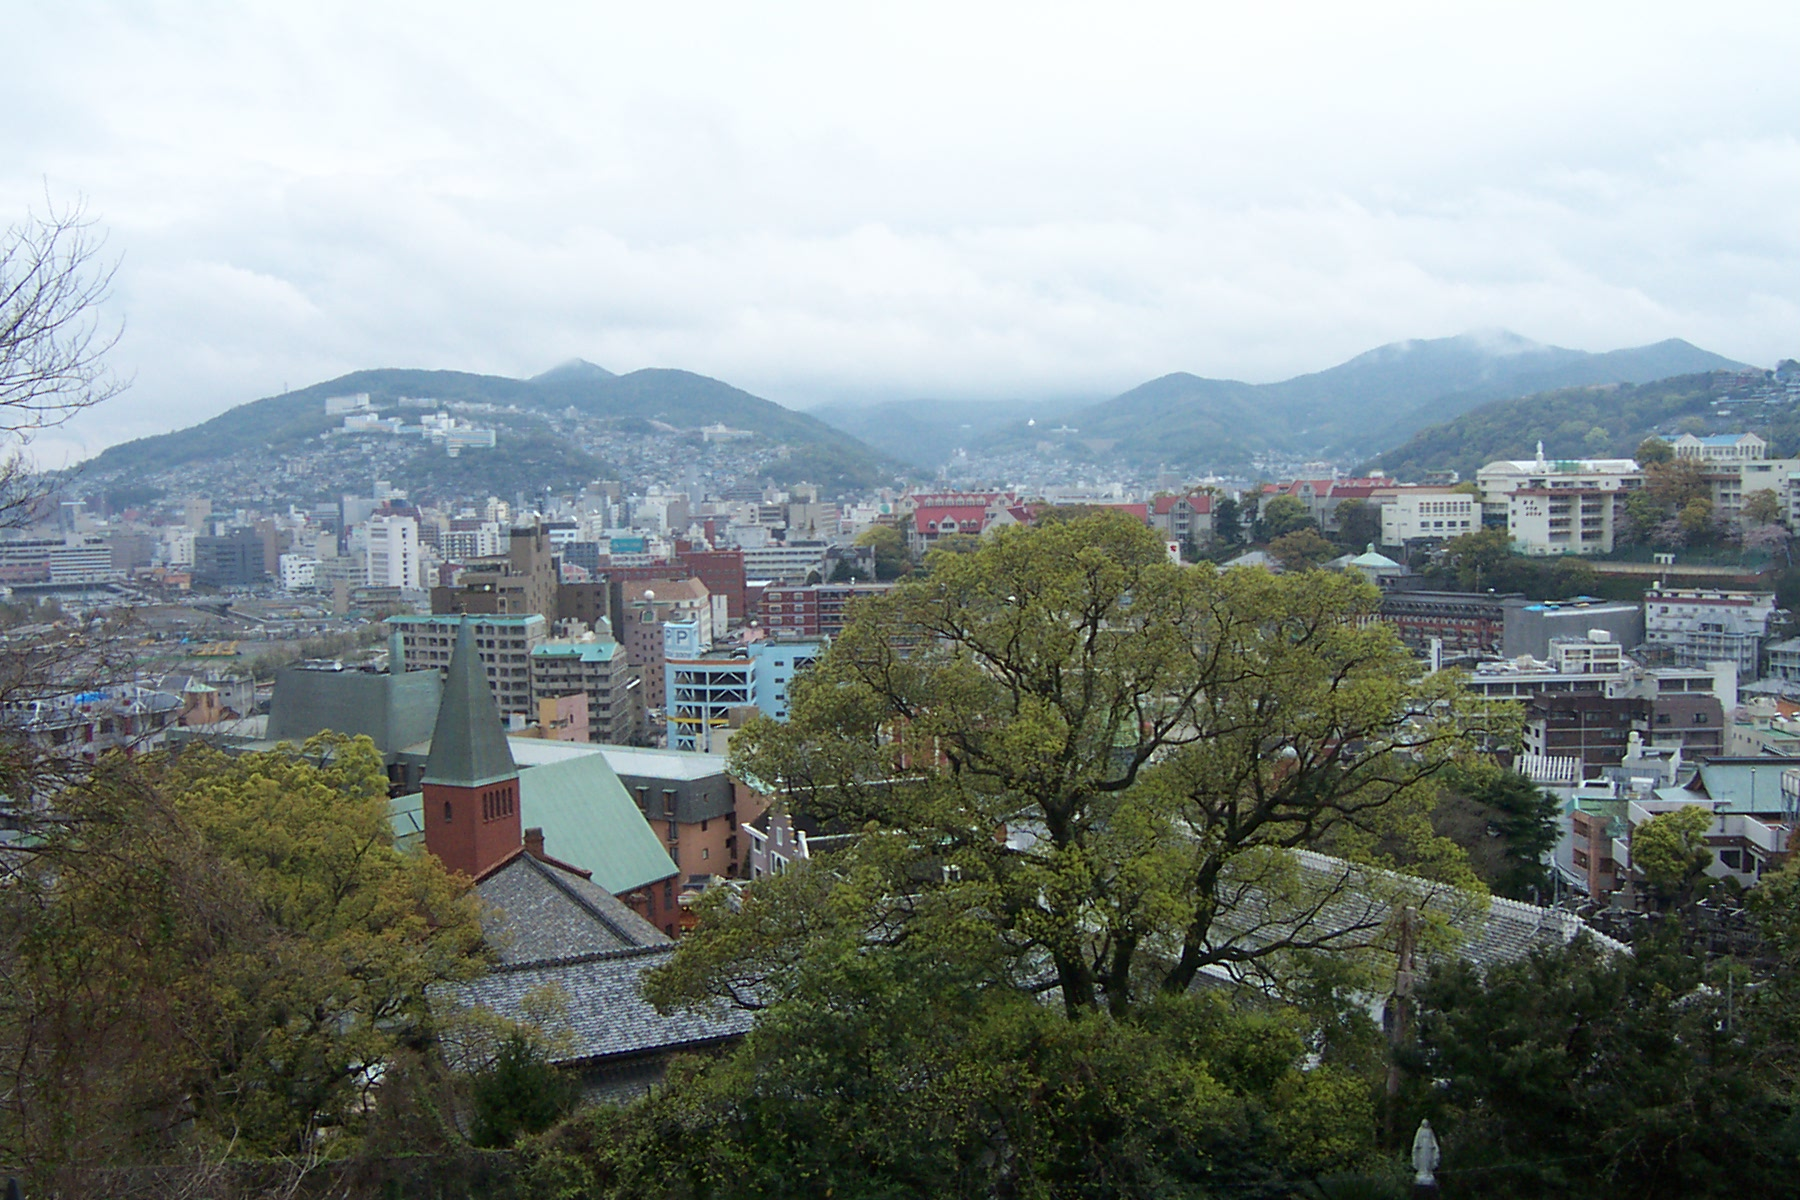 Nagasaki, on Japan's southernmost island, Kyushu